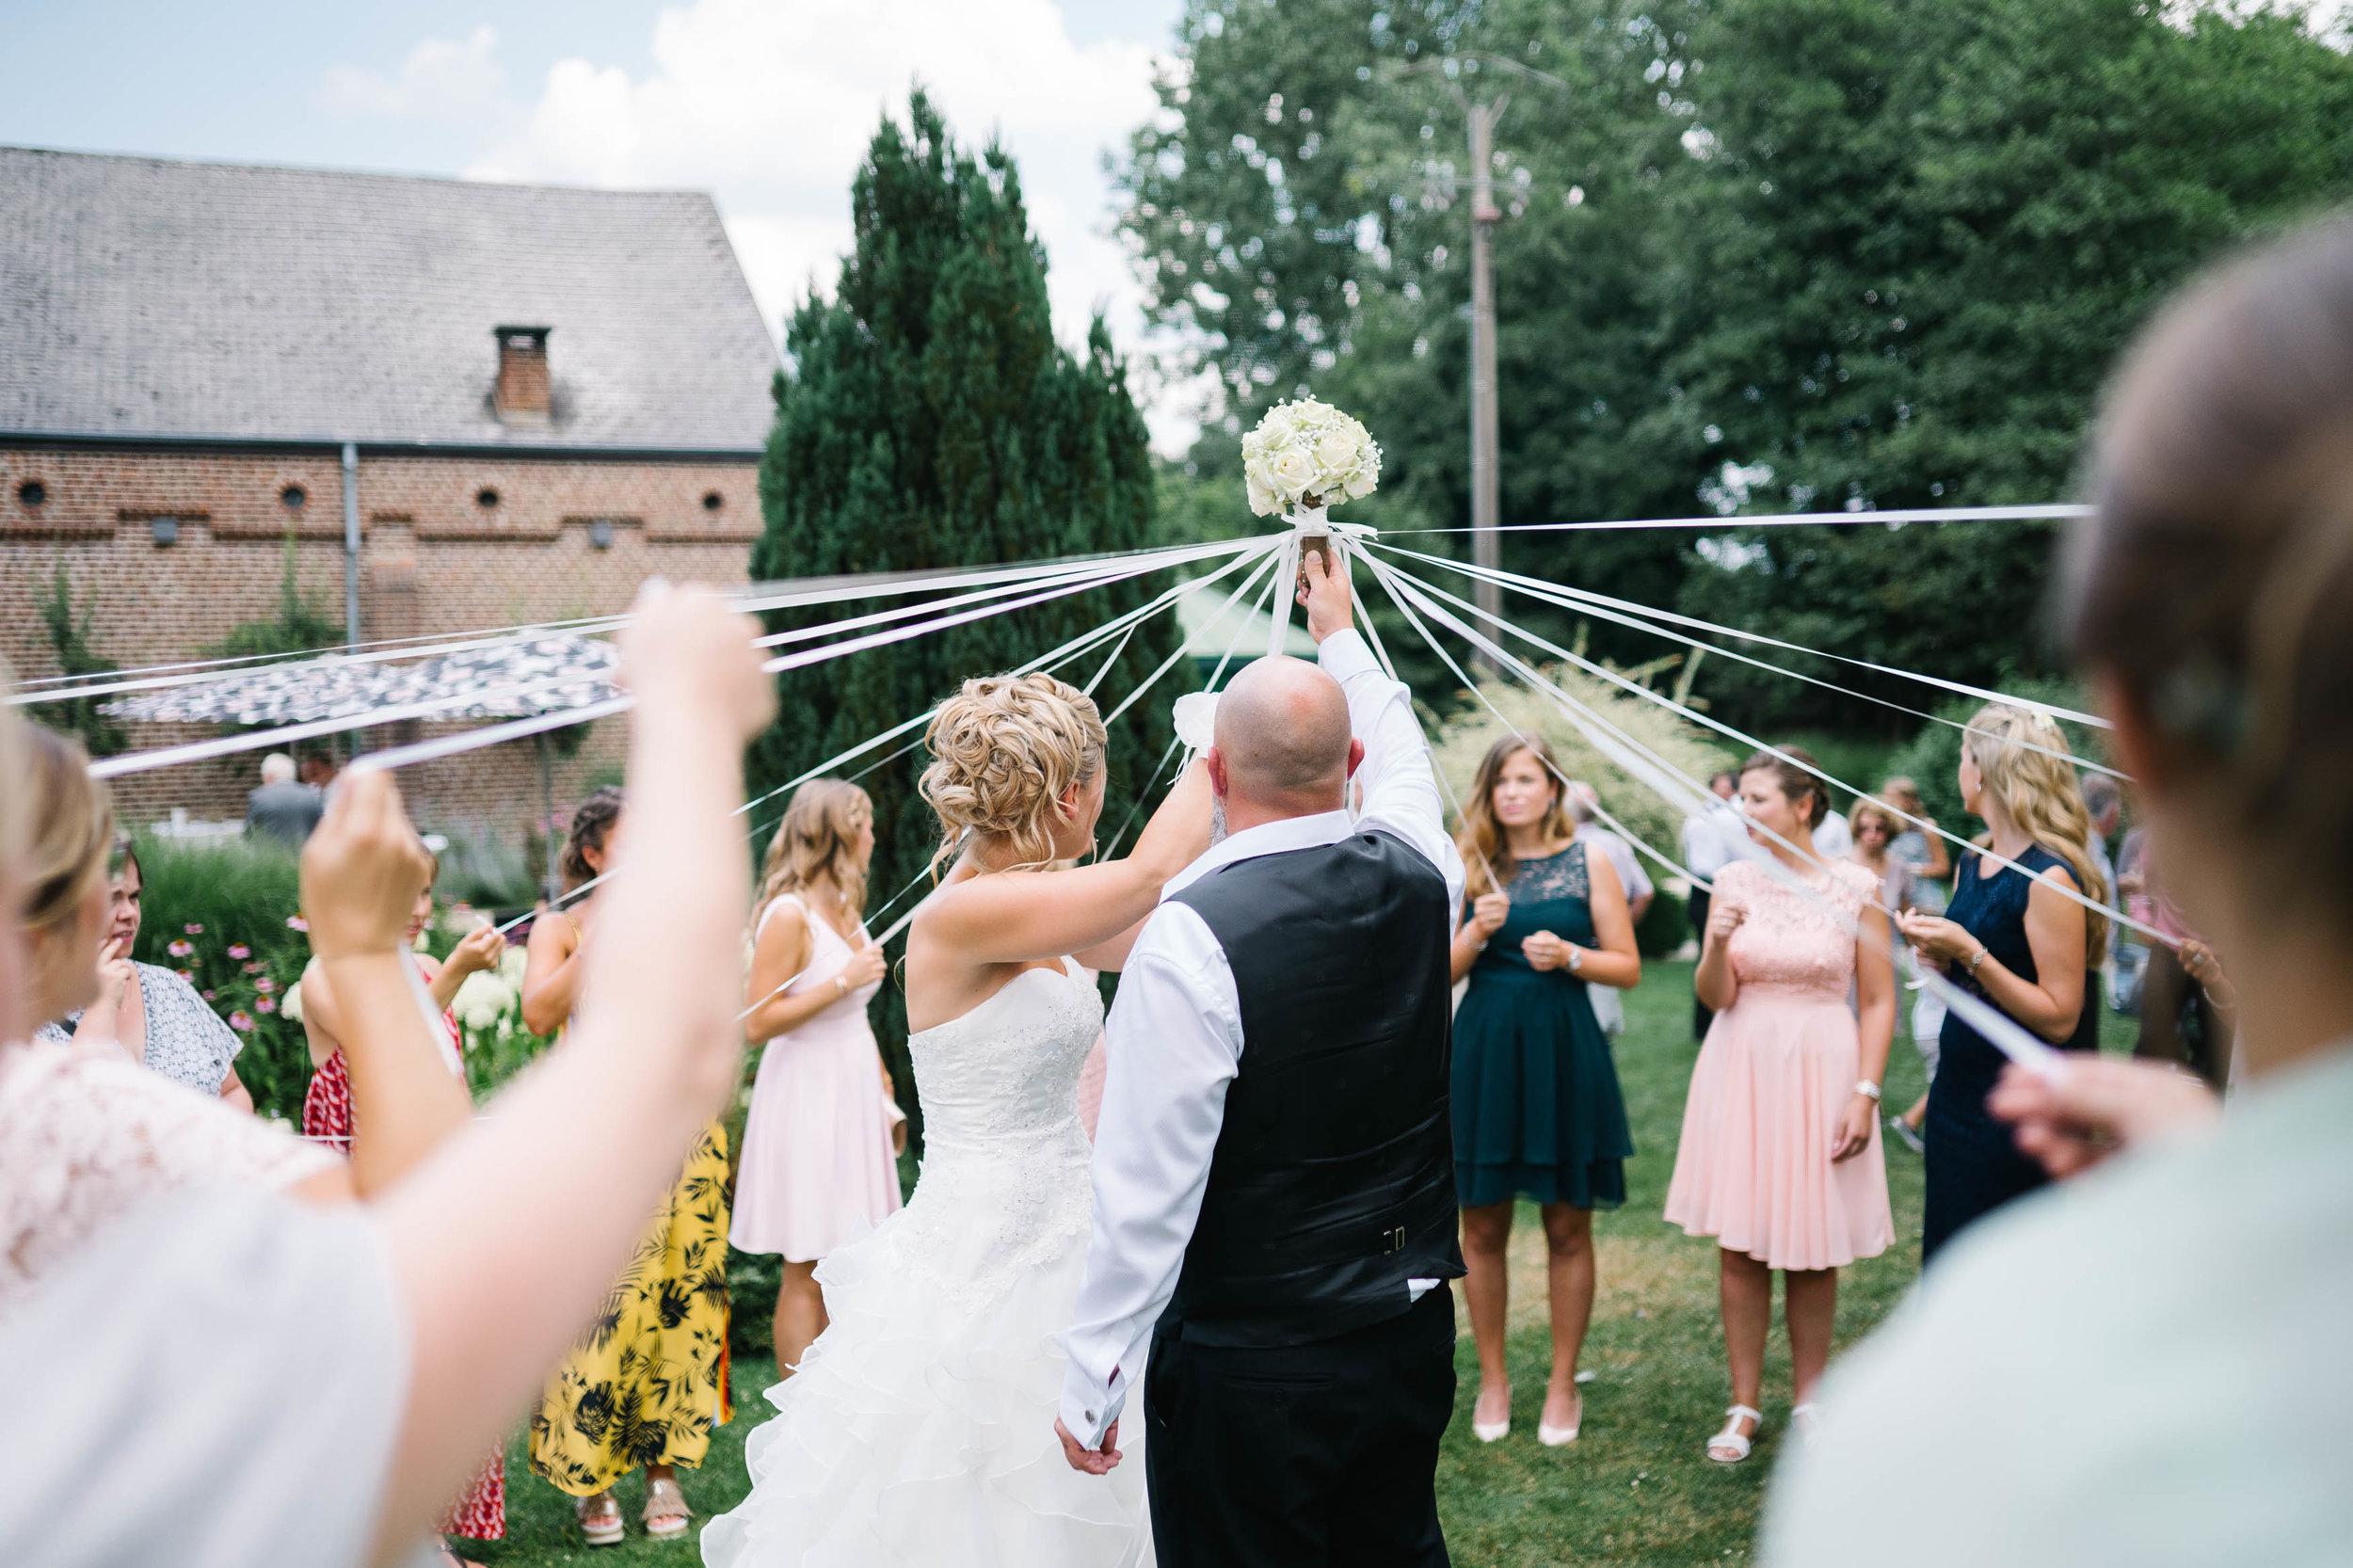 c-photographe-videaste-mariage-bruxelles-leleu-26.jpg